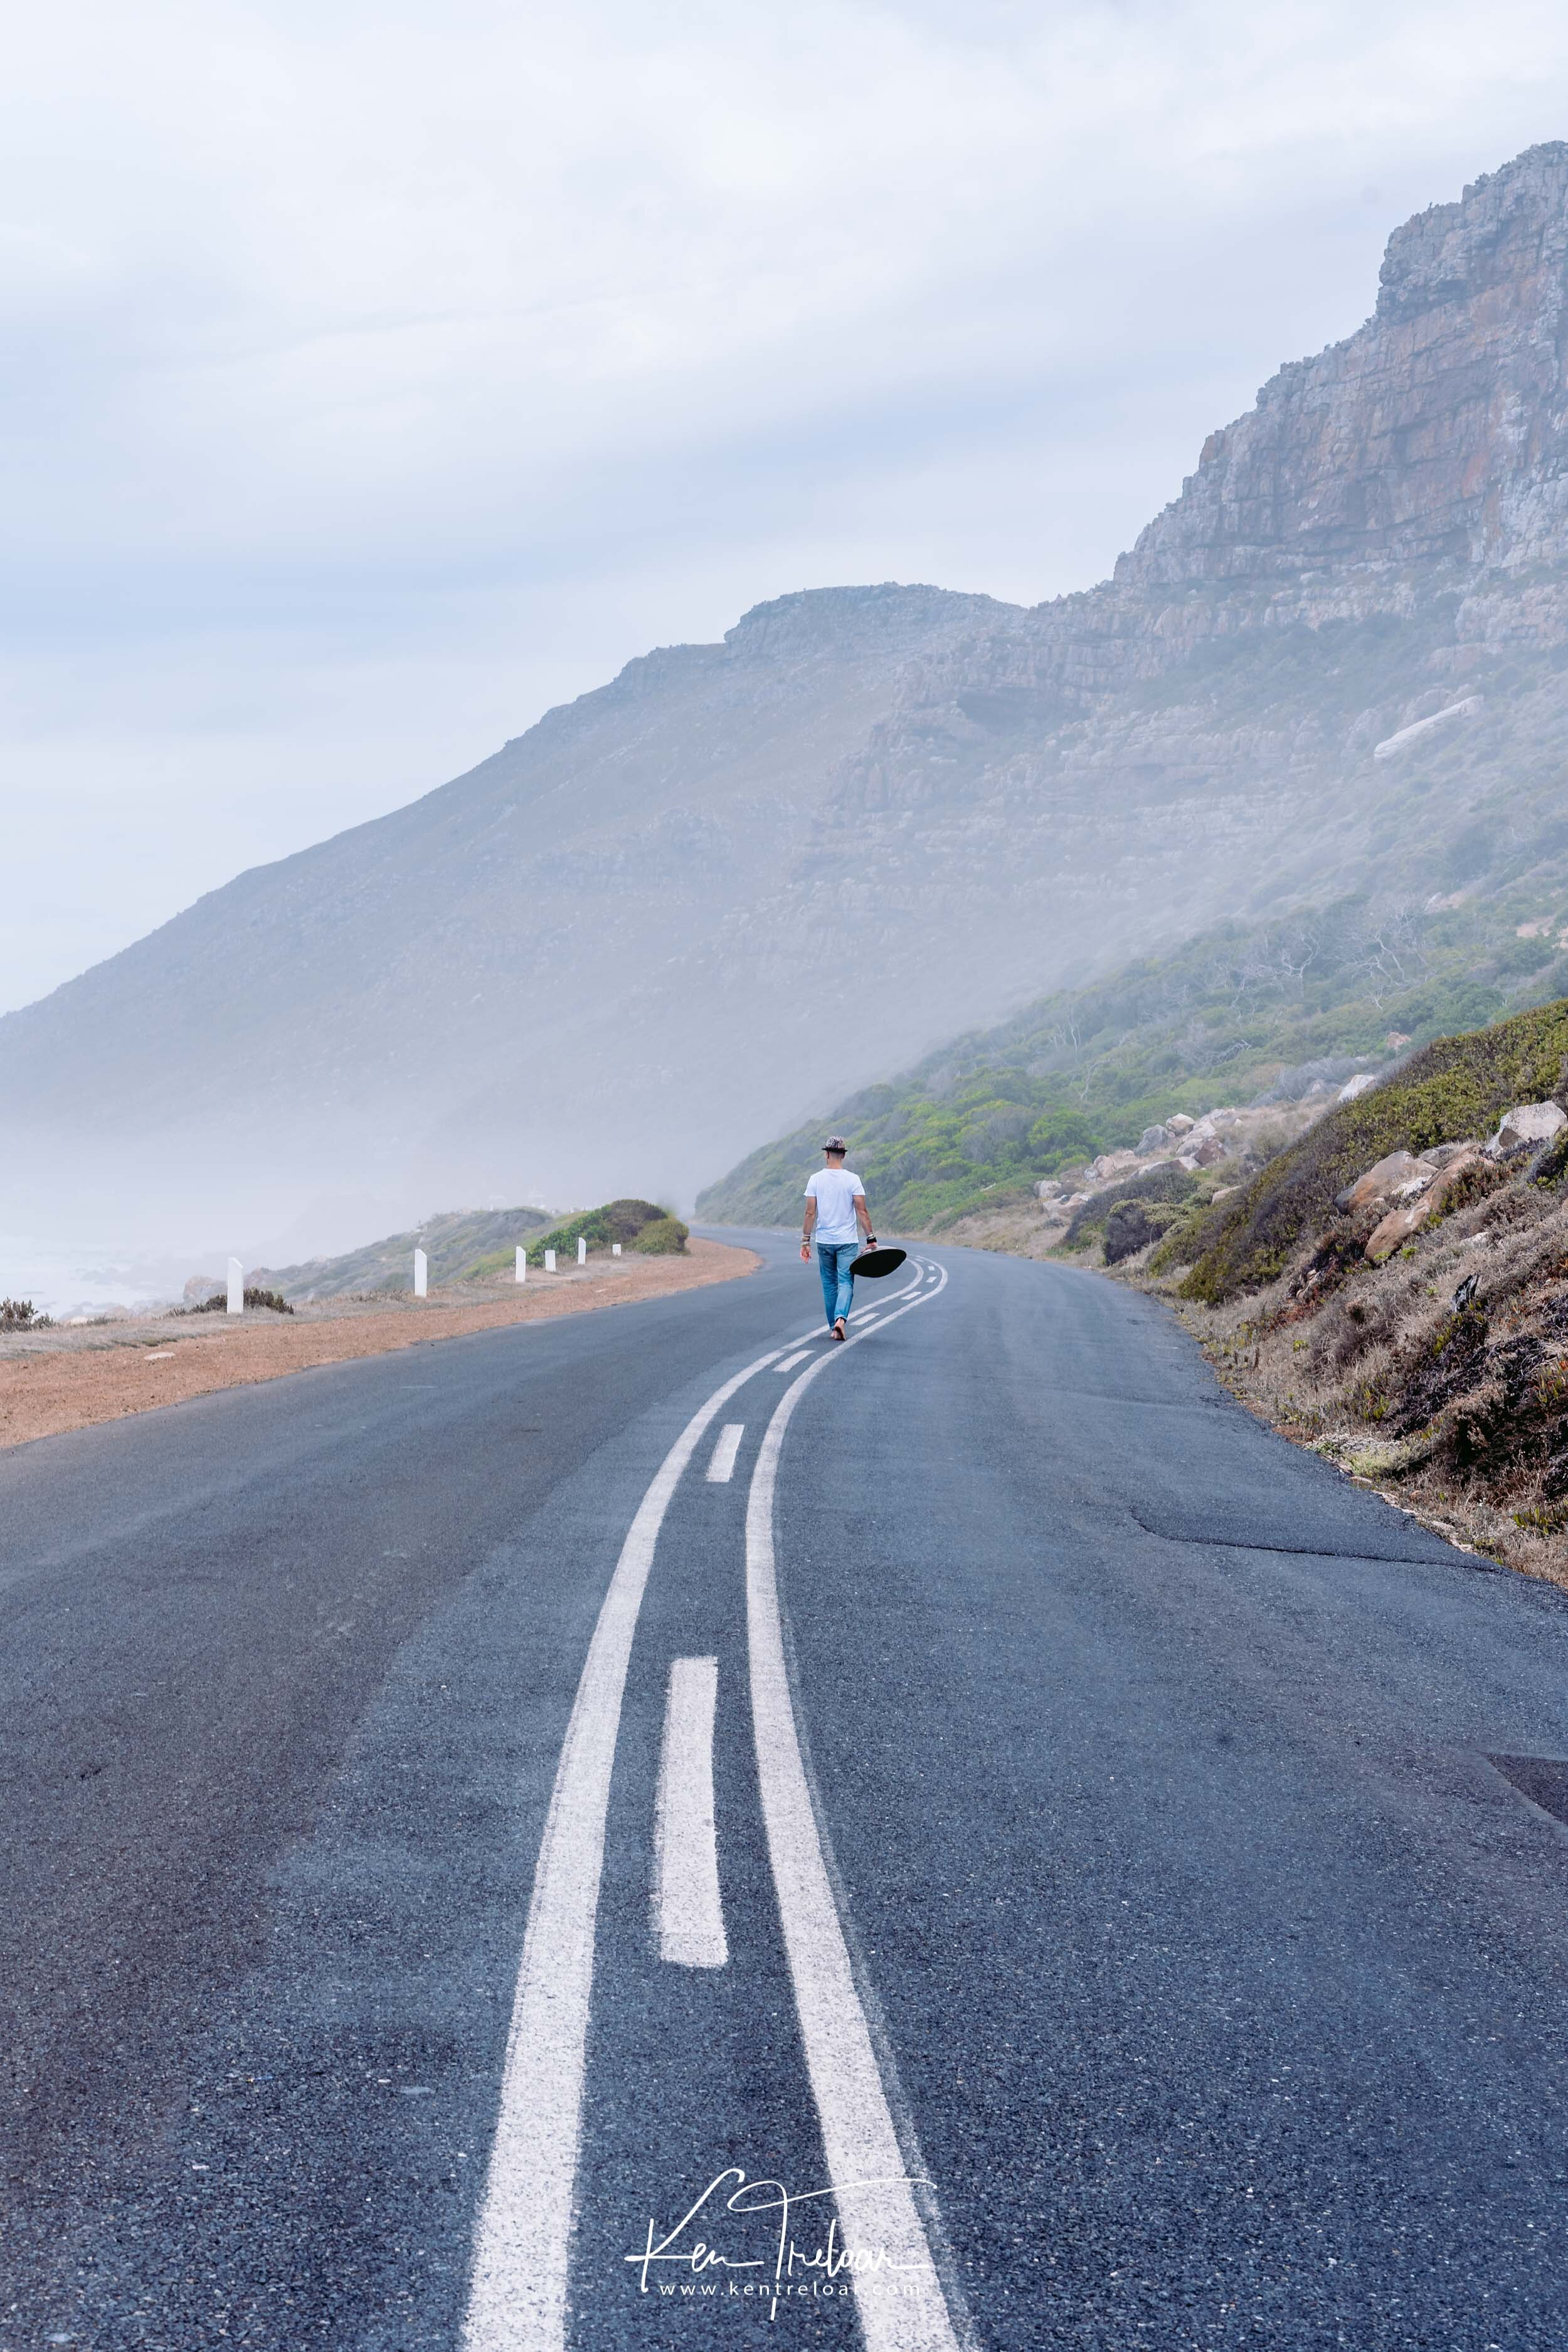 Marci Selvaggio - Hang Instrument Cape Town Tour - South Afica - Misty Cliffs -  Image by Ken Treloar.jpg